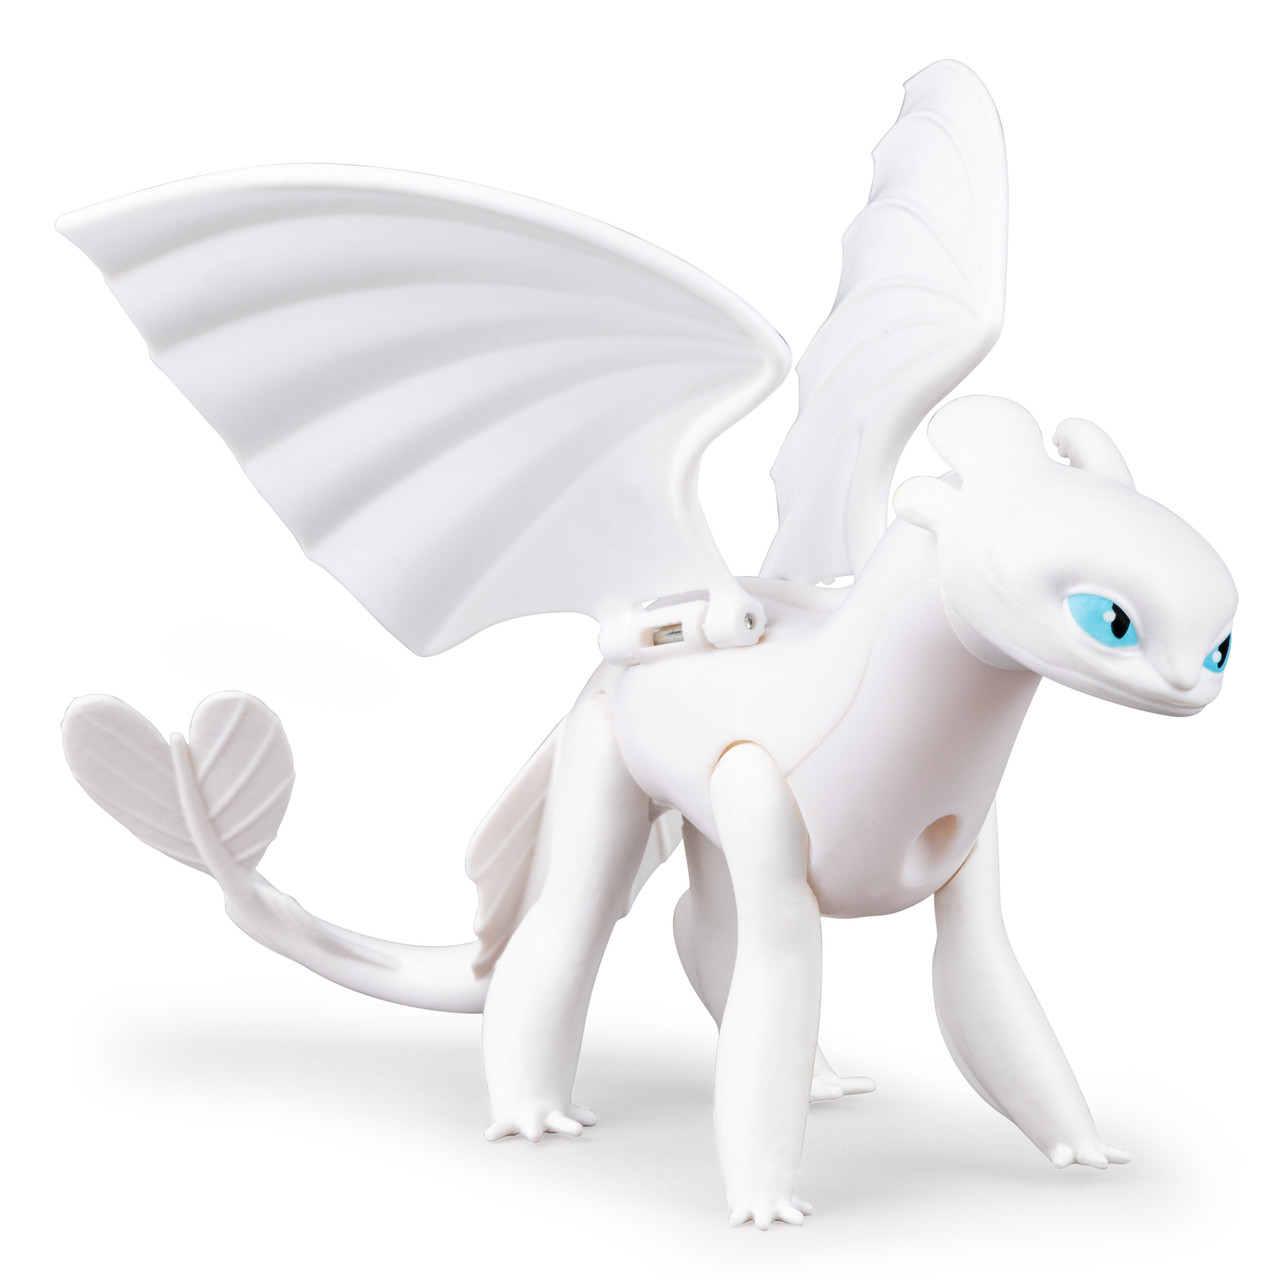 DreamWorks Dragons Как приручить дракона дракон дневная фурия Lightfury Dragon Moving Parts